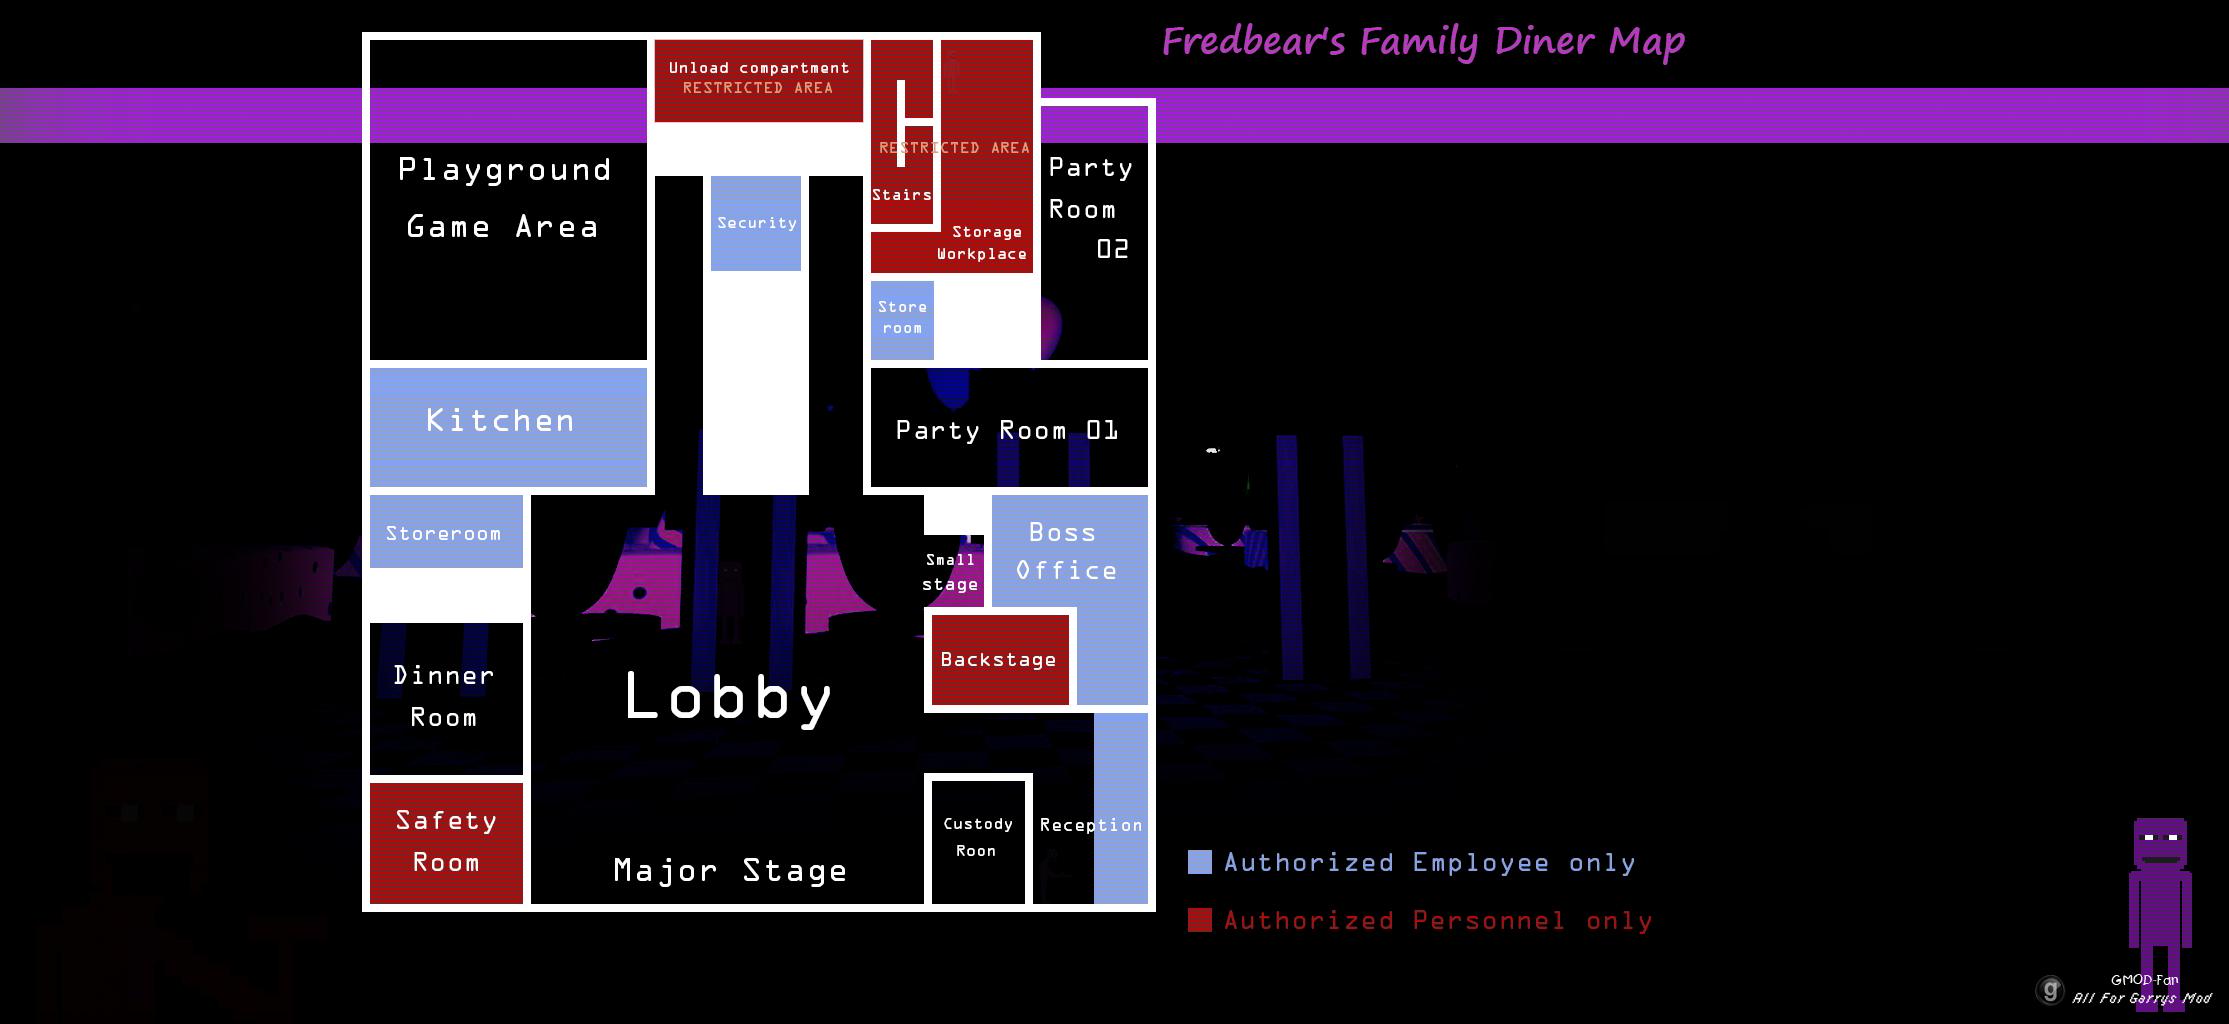 Bgs Fnaf Fredbears Family Diner Map - BerkshireRegion